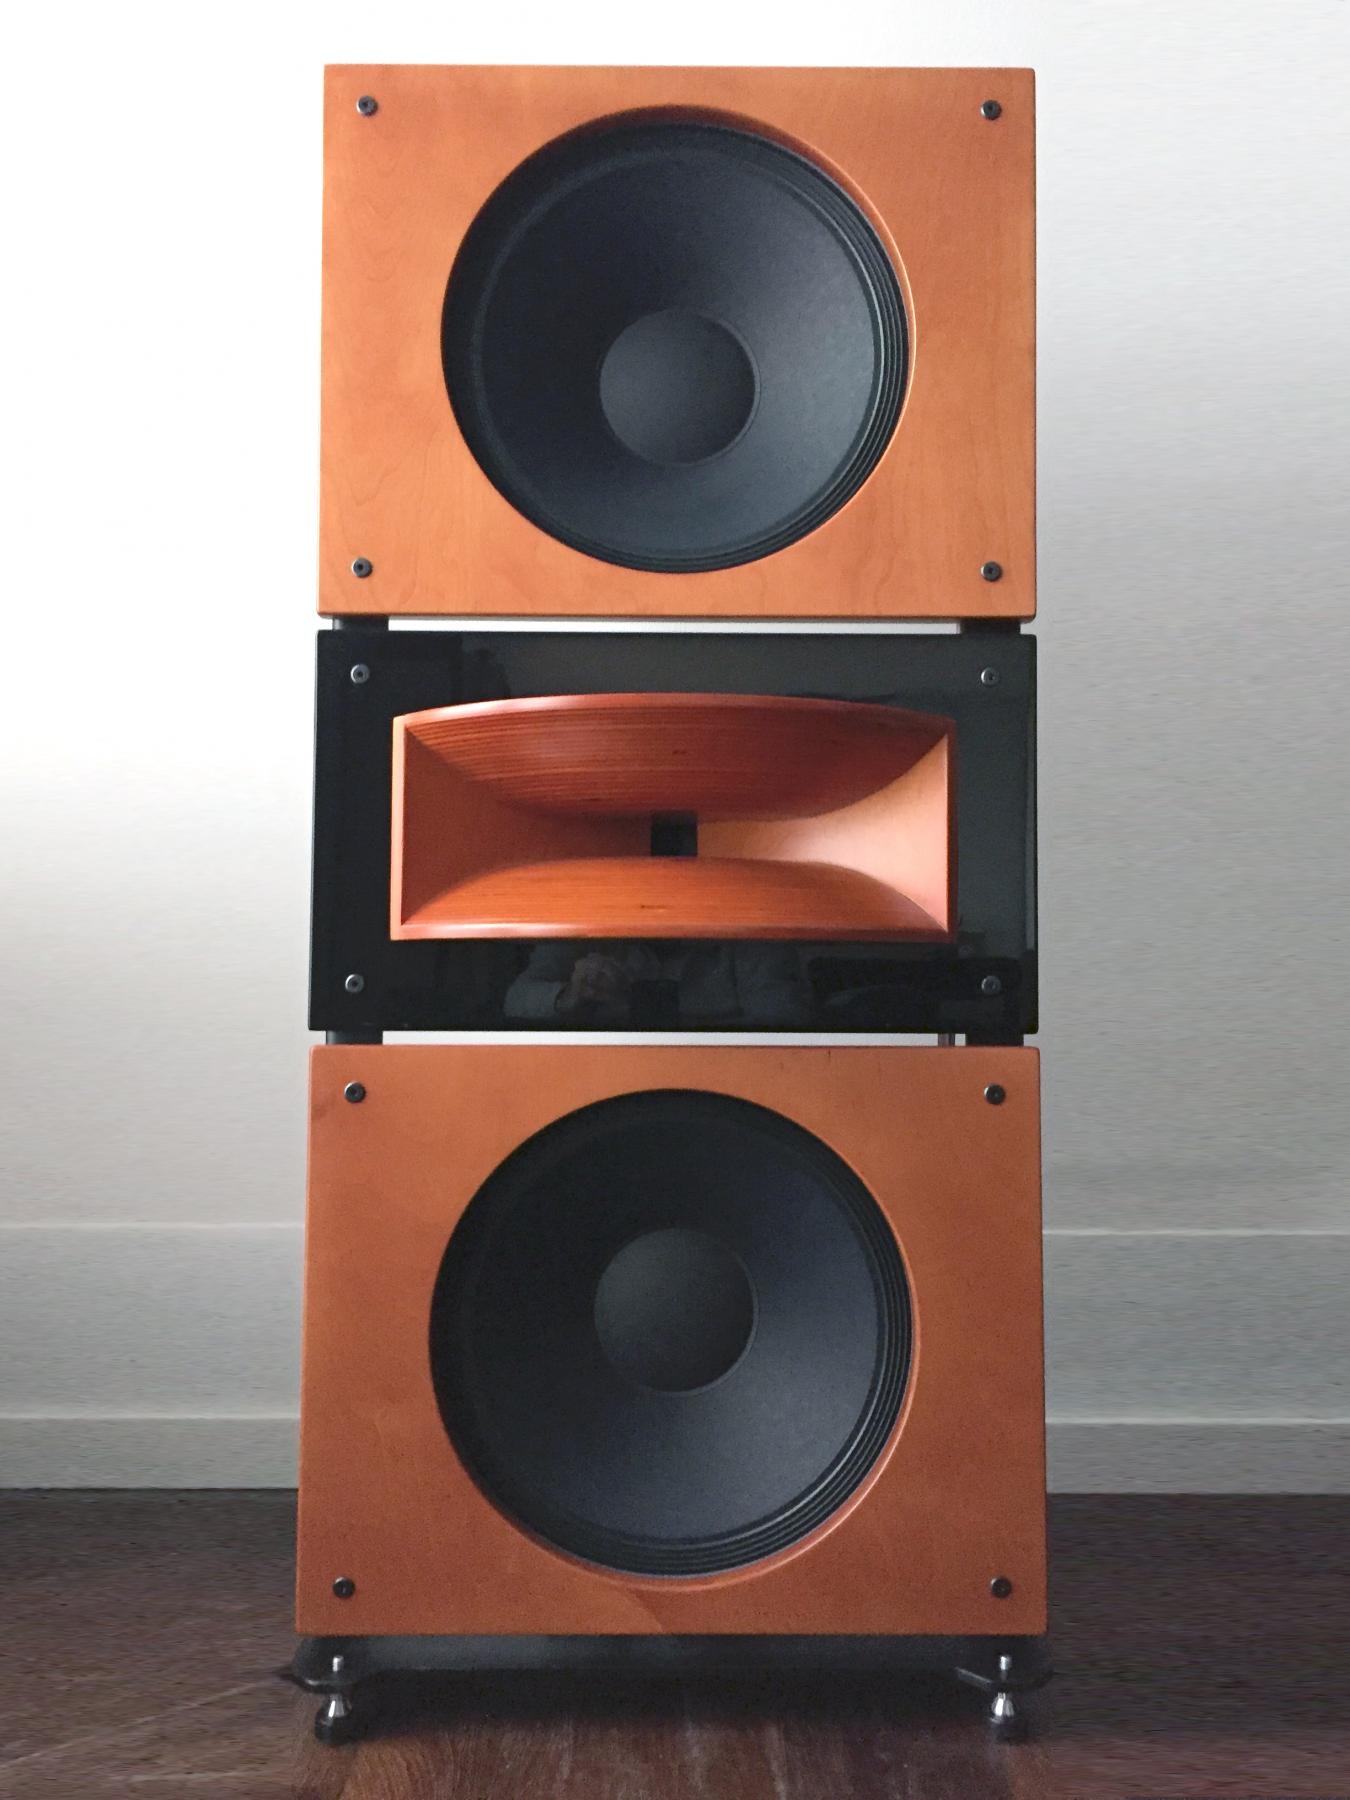 PureAudioProject Trio15 Horn1 loudspeakers